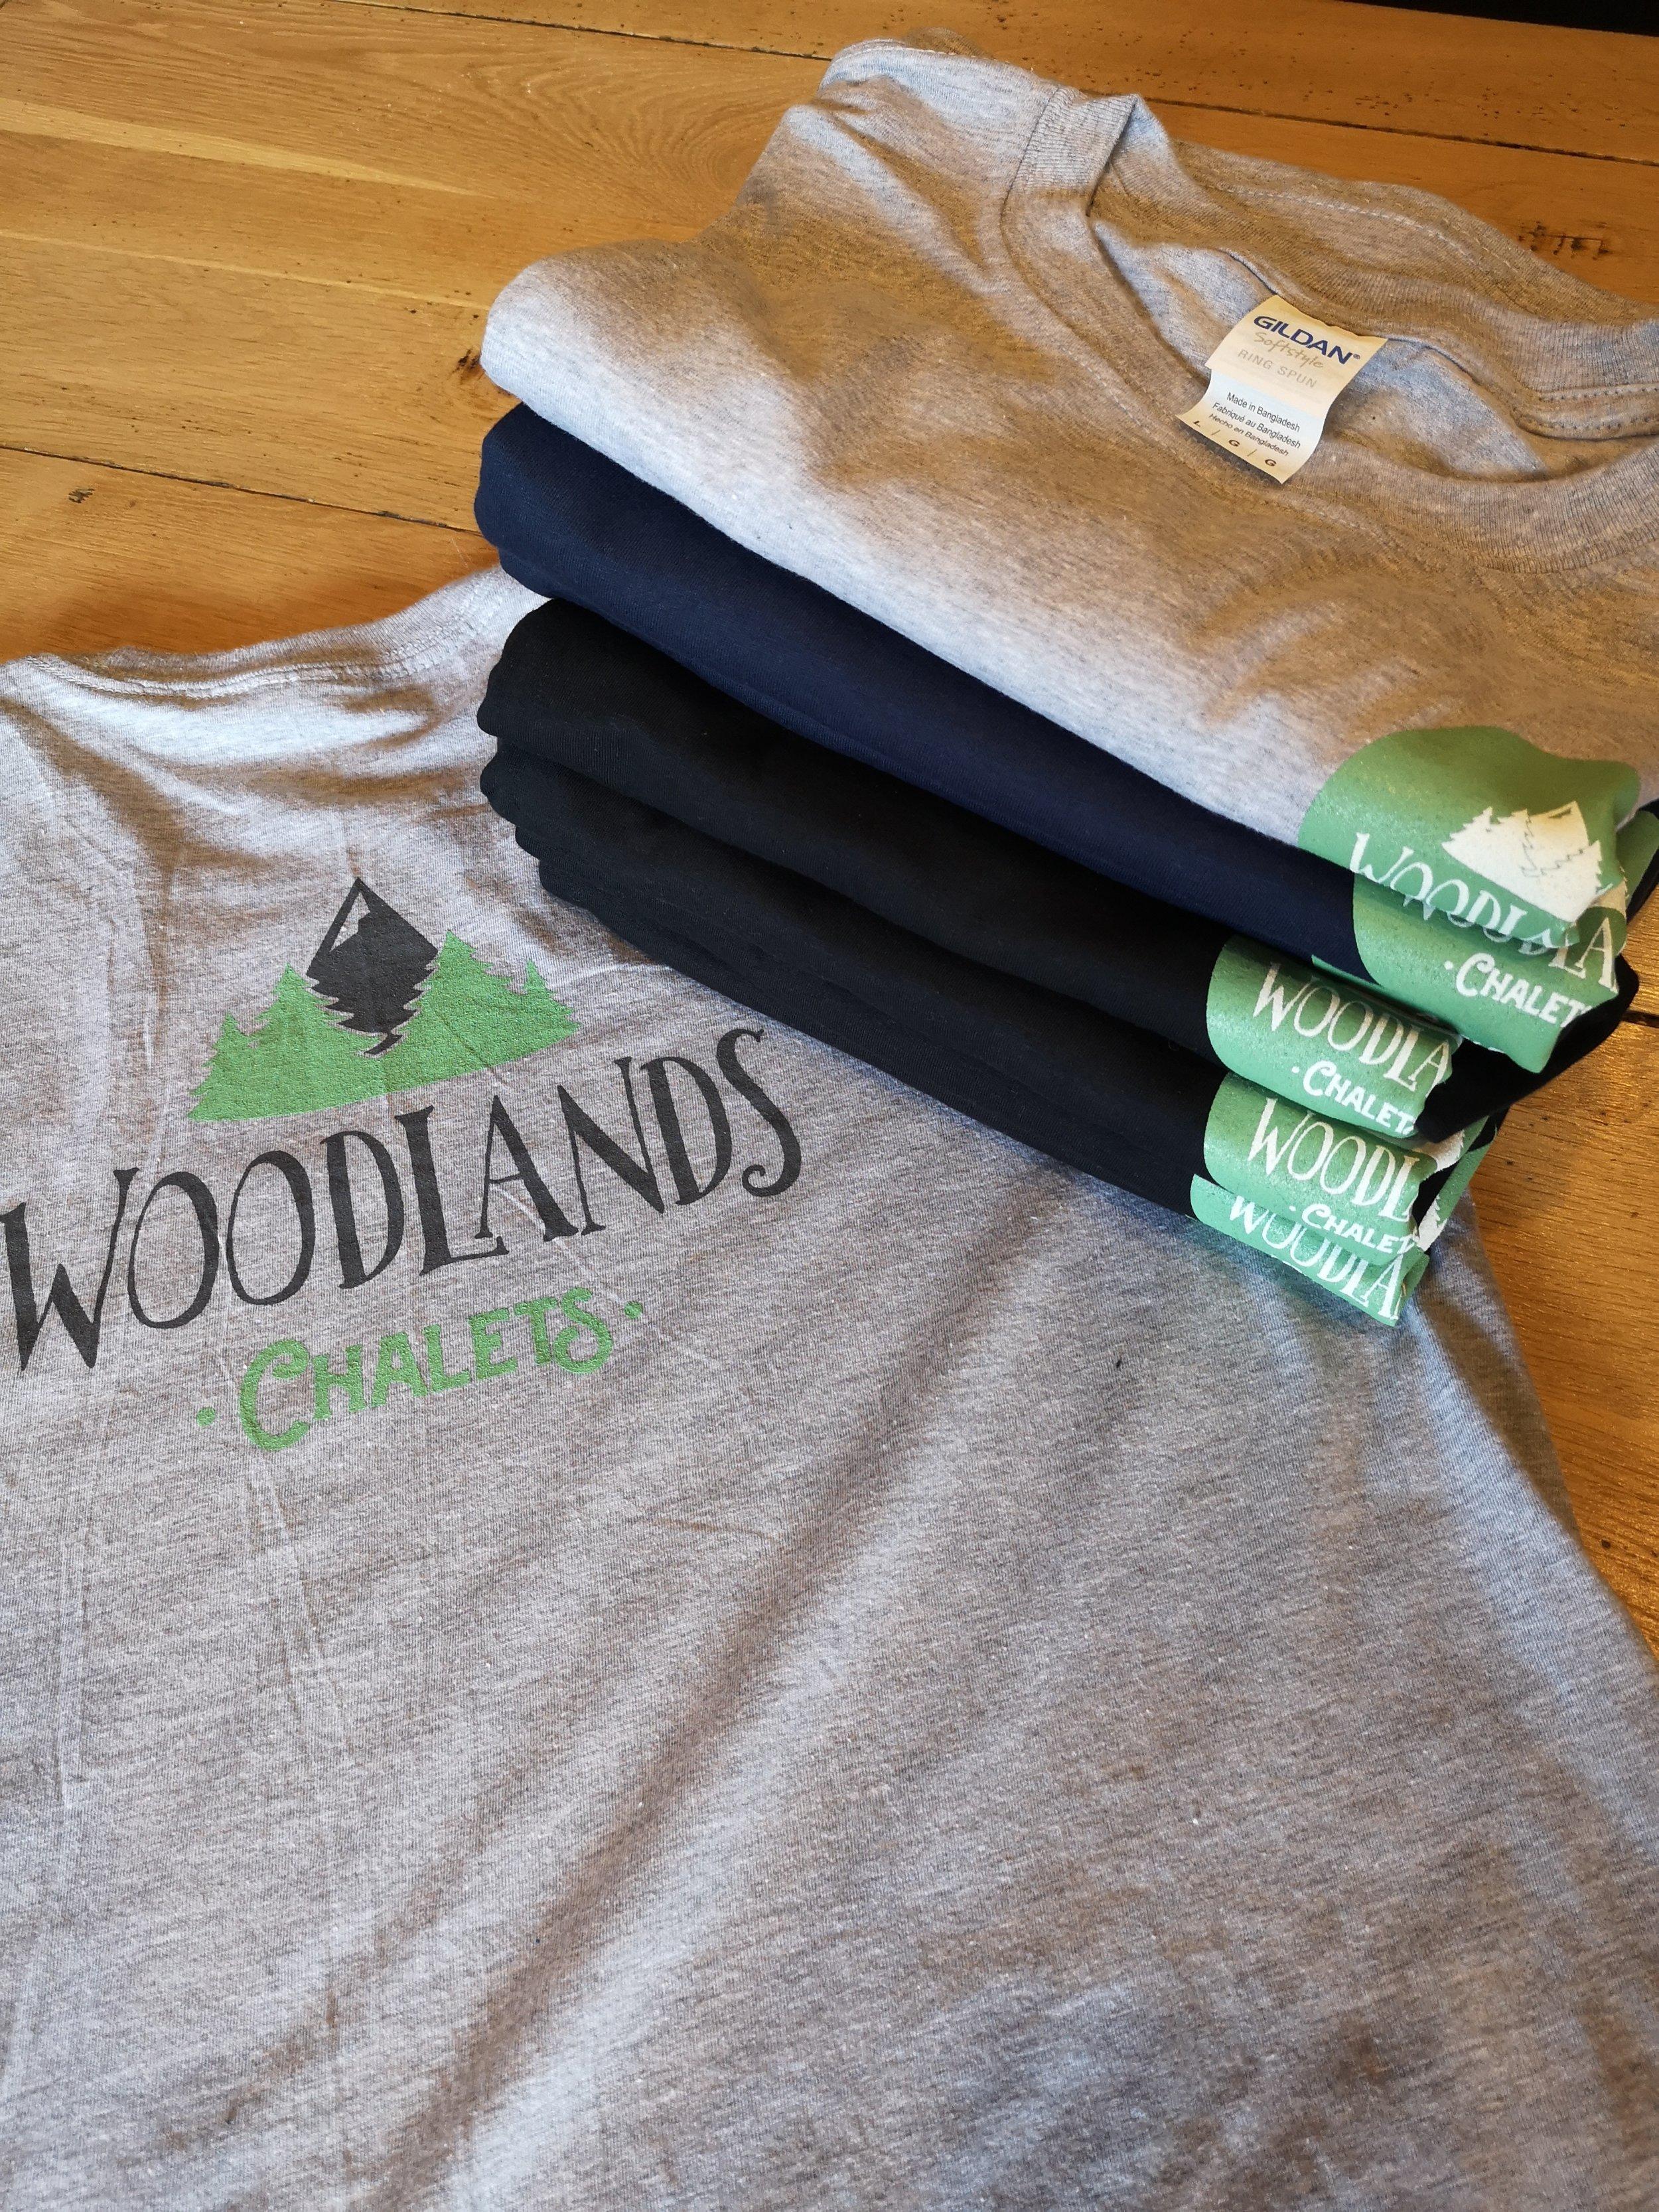 Woodlands Tshirts.jpg